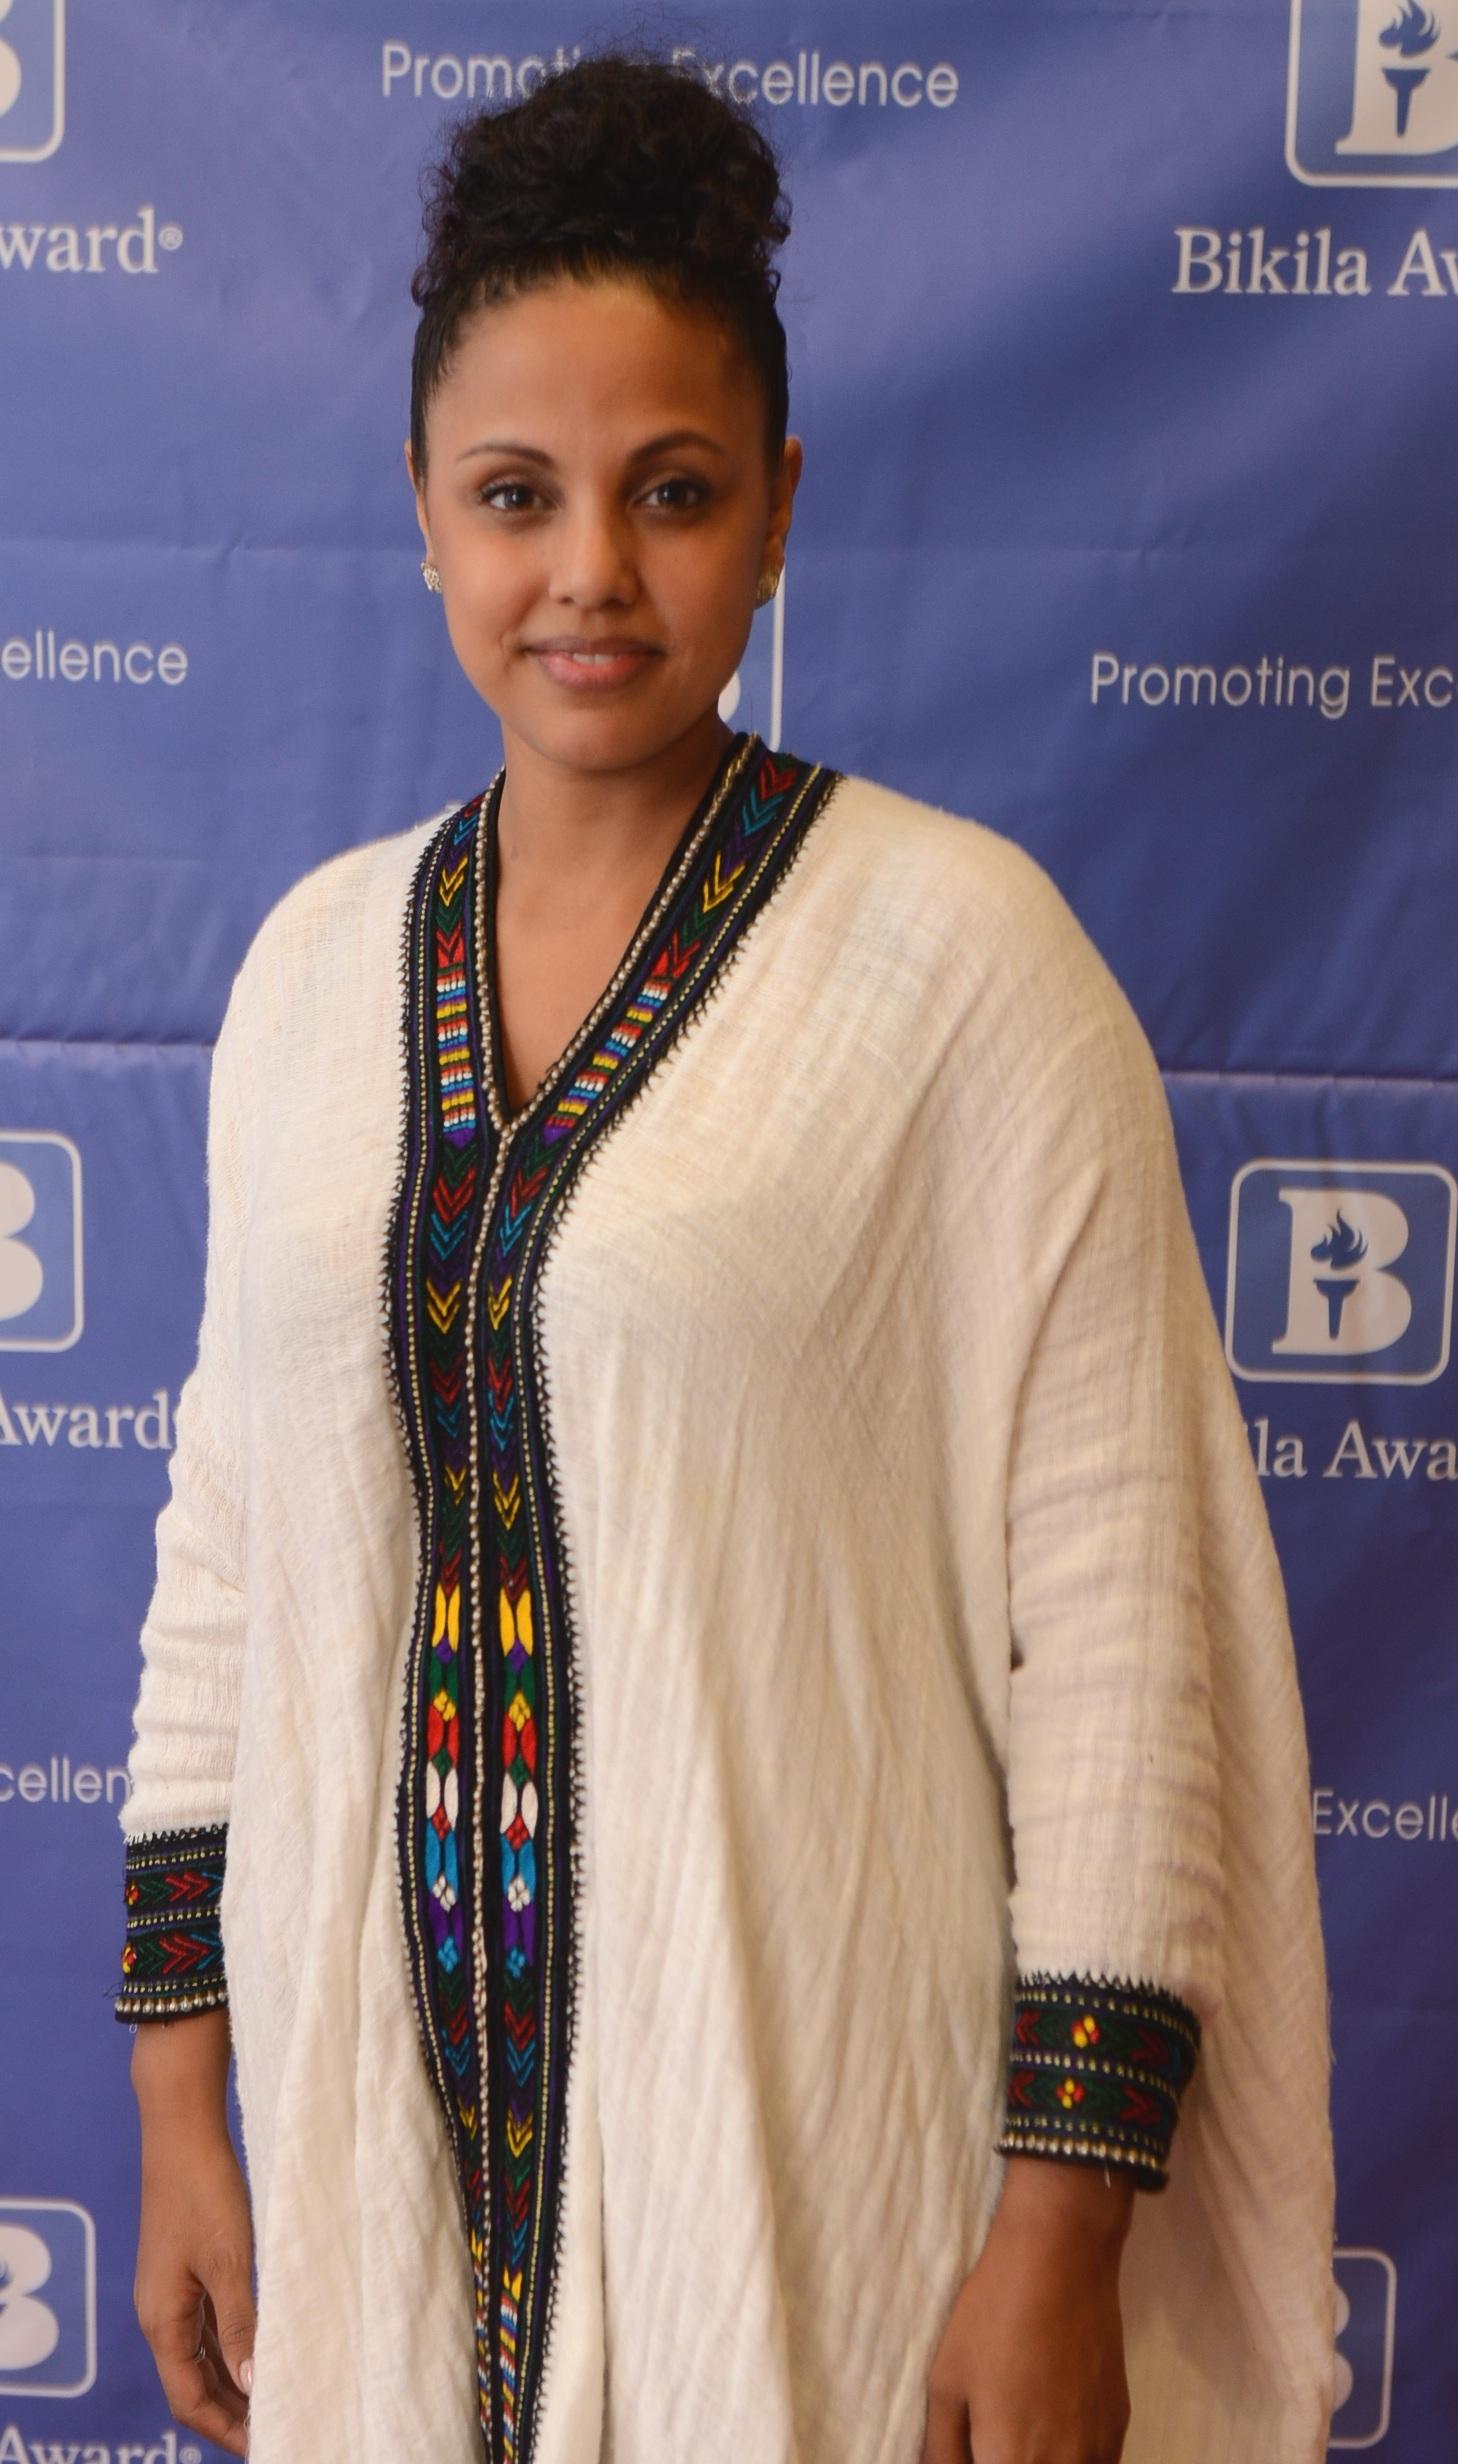 2015 Bikila Award winner Weyni Mengesha